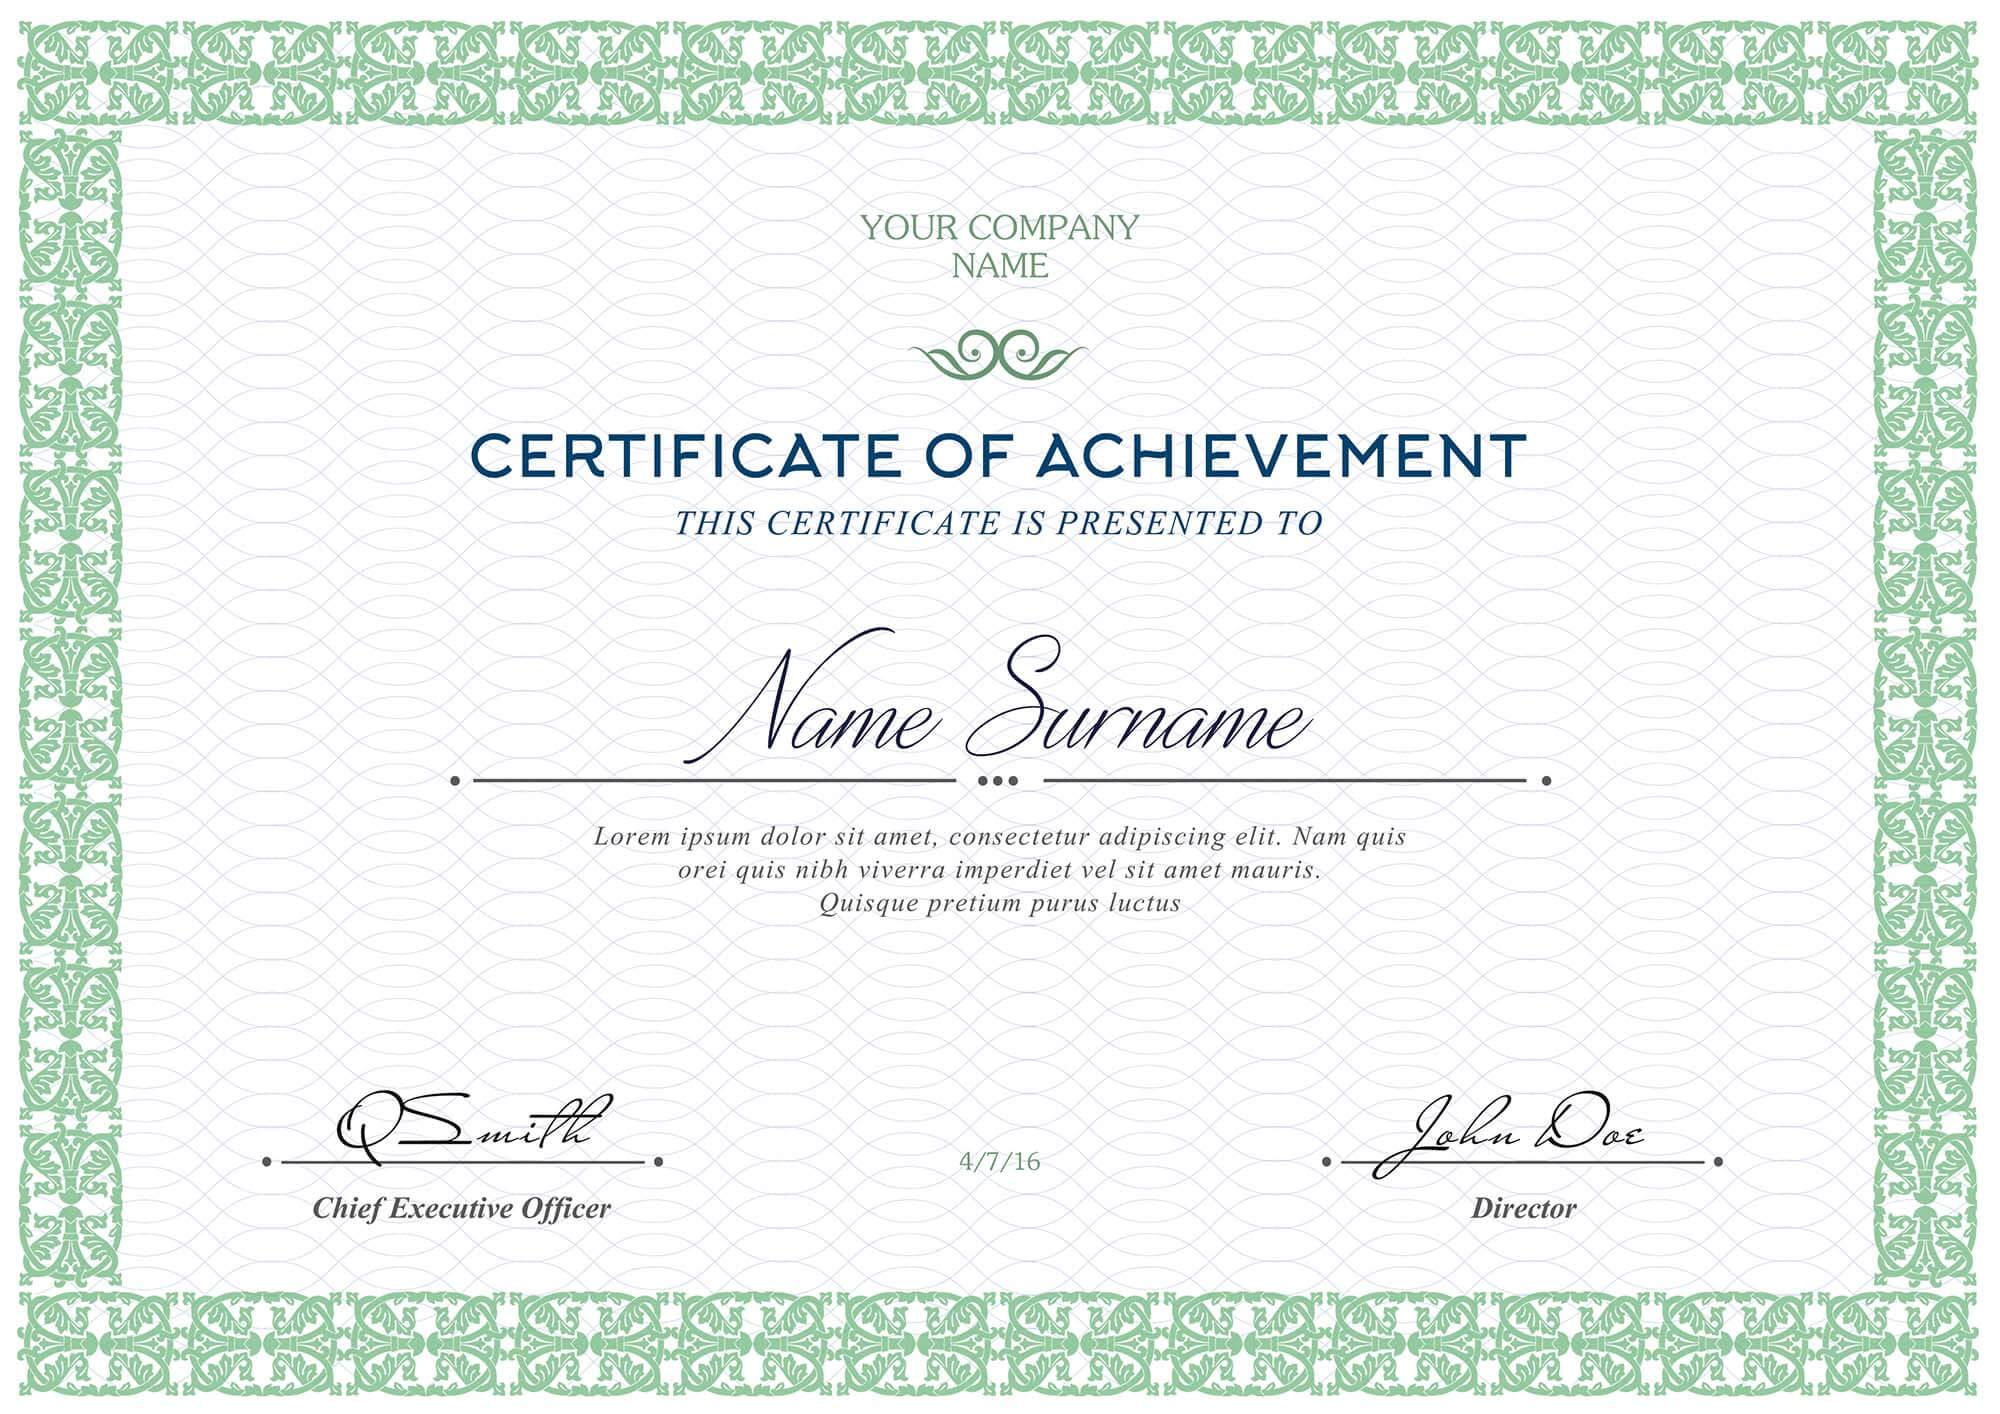 certificate blank templates template certificates retirement psd tunu redmini sample within regard driving safe pertaining printable plan professional completion fishainsurance